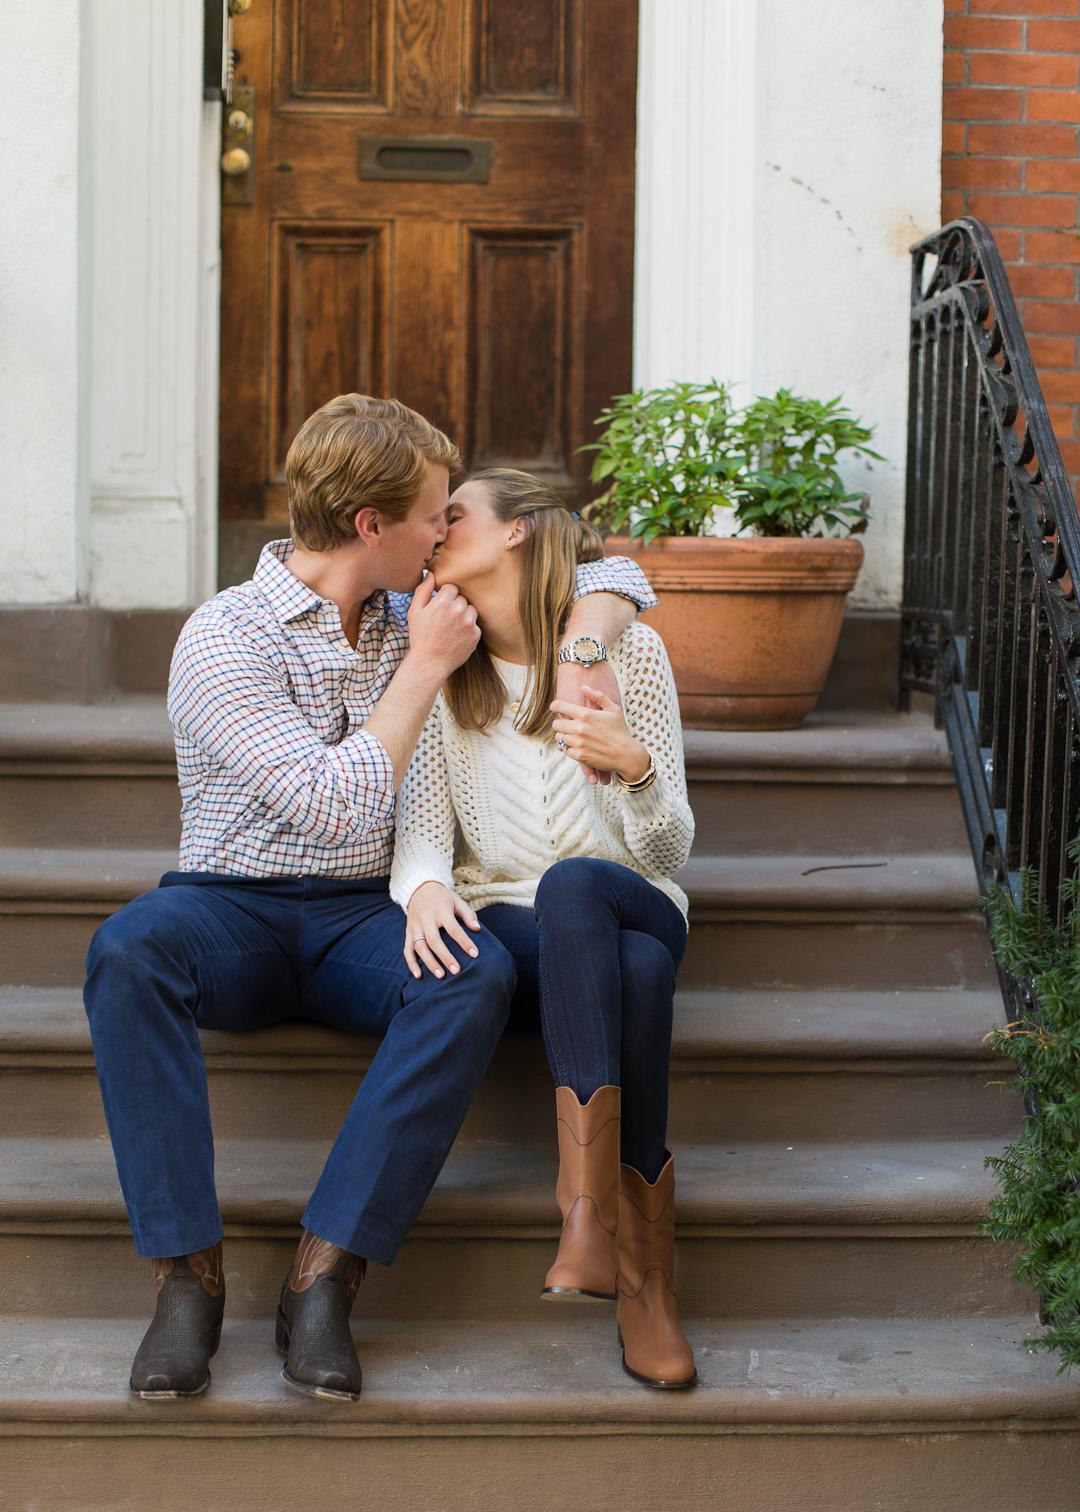 Melissa Kruse Photography - Megan & Tyler West Village Engagement Photos-51.jpg